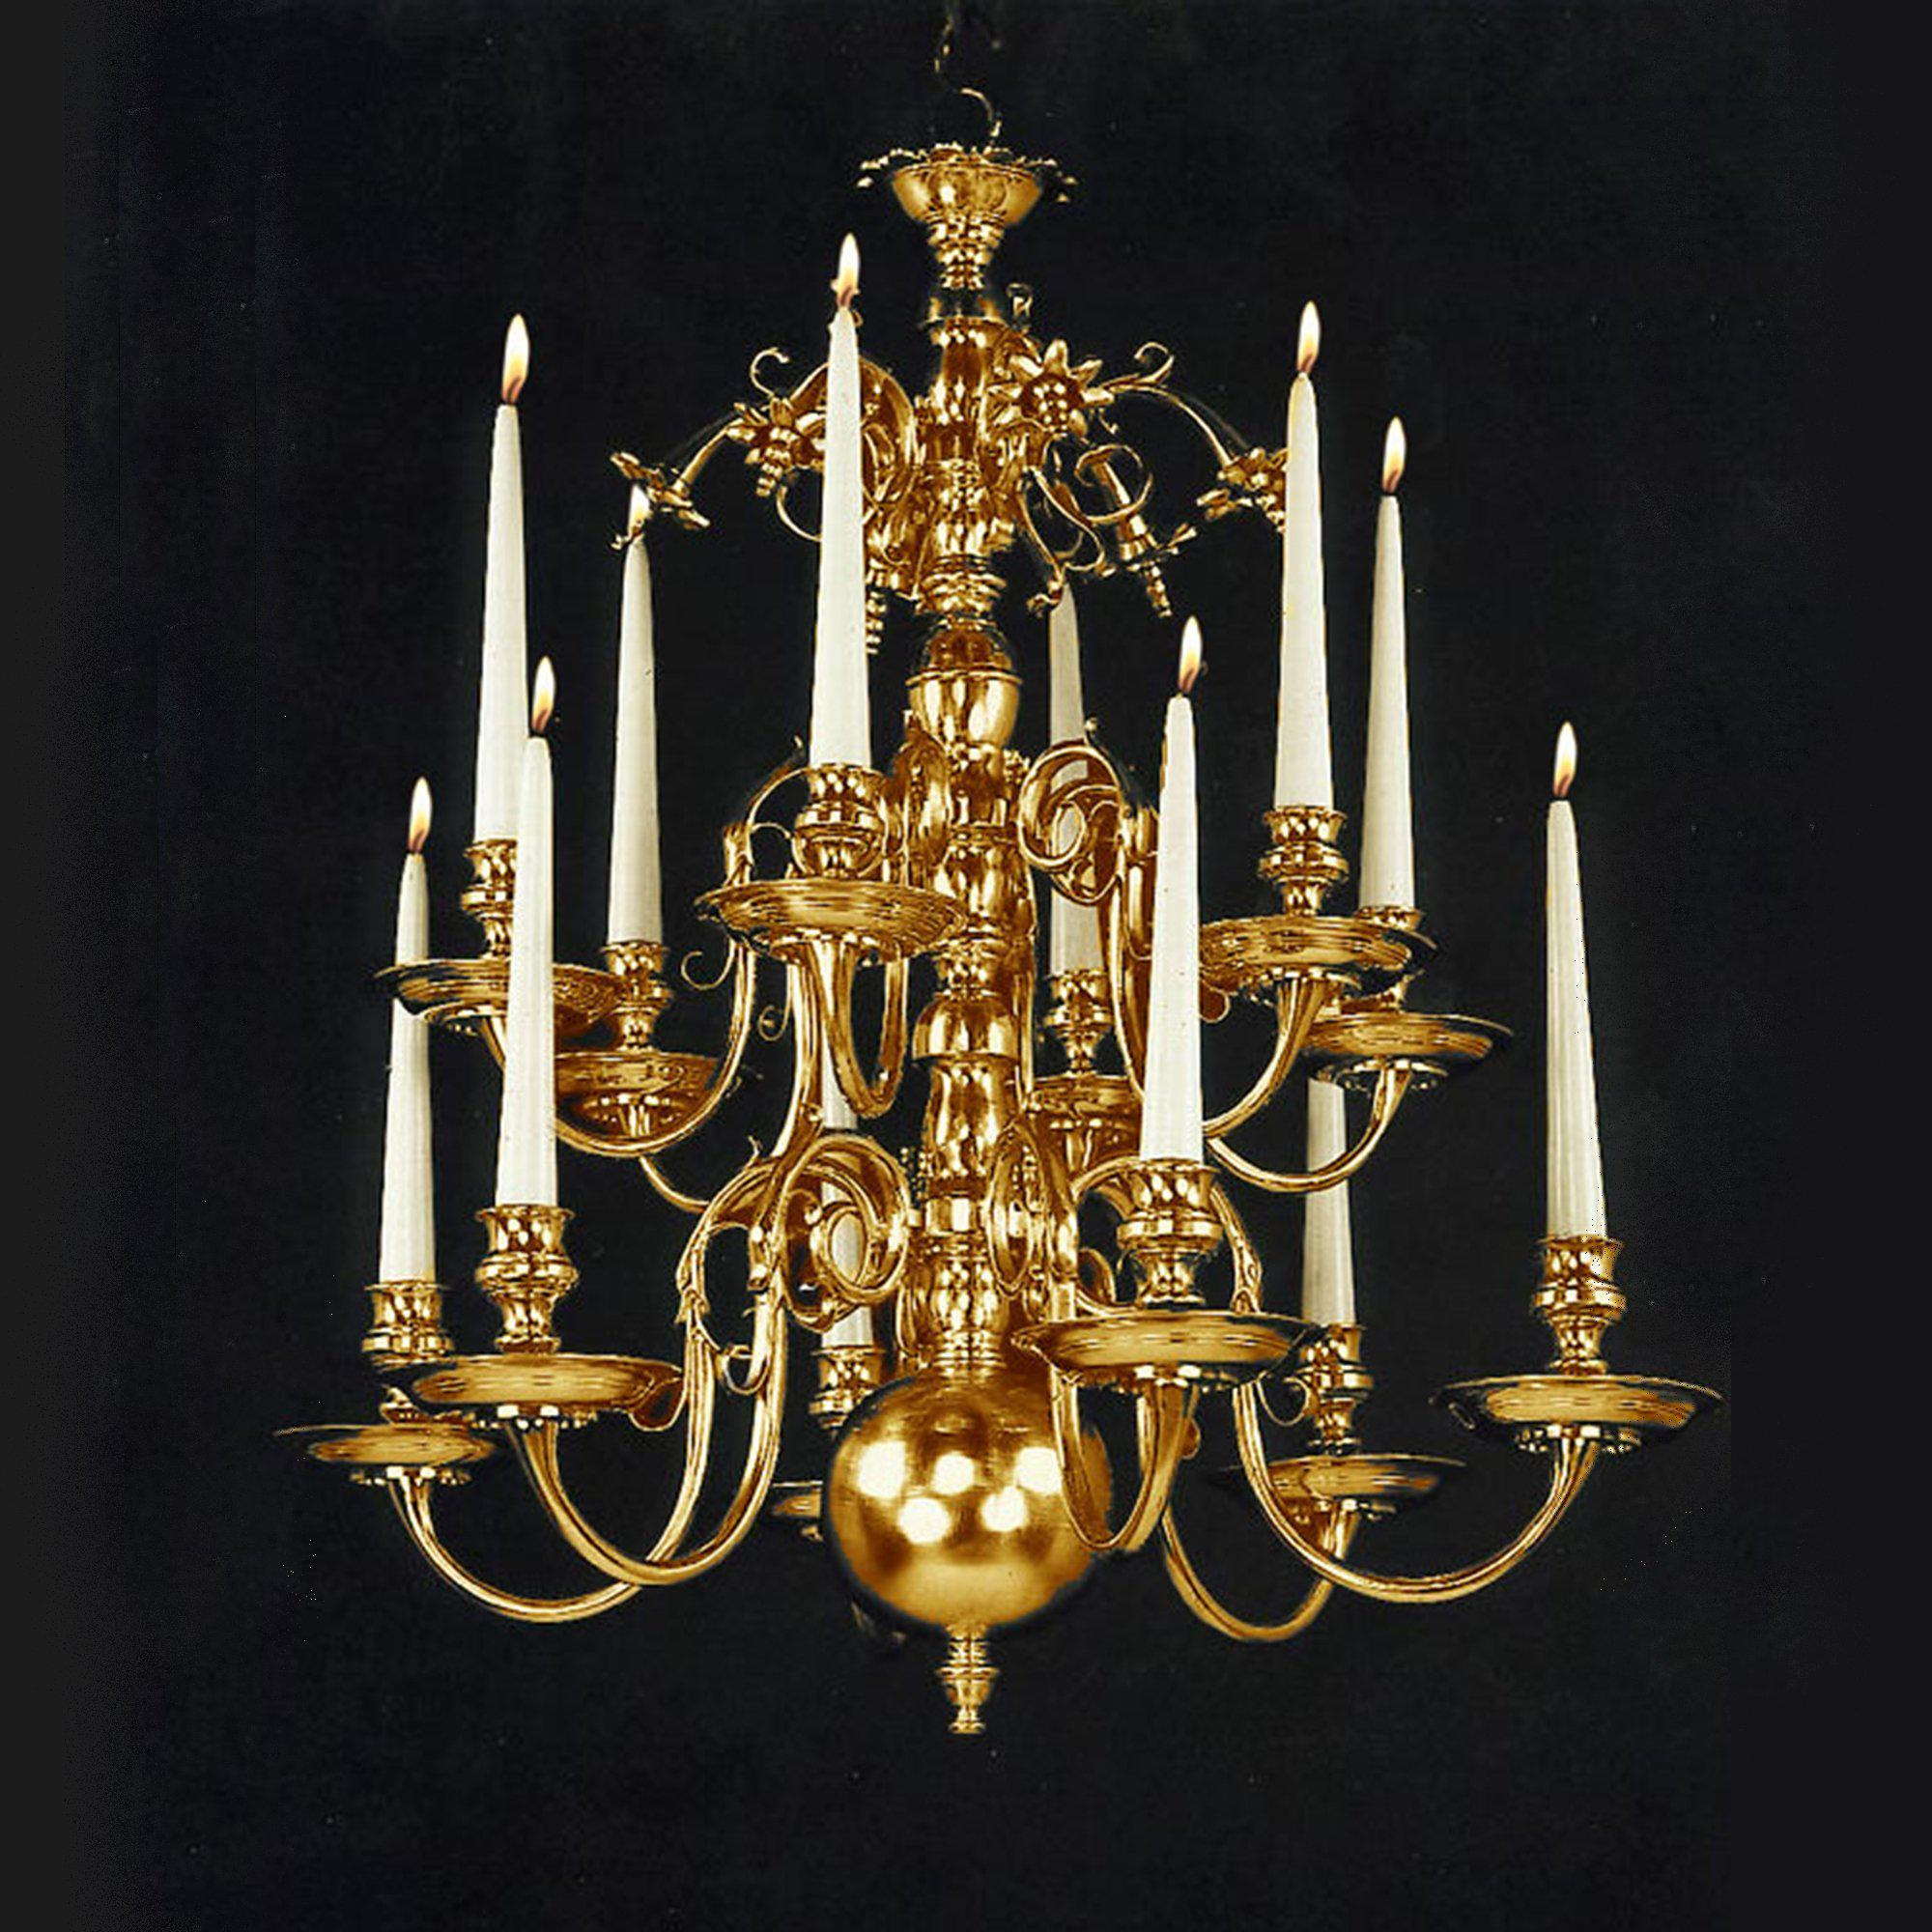 Hollandais chandelier